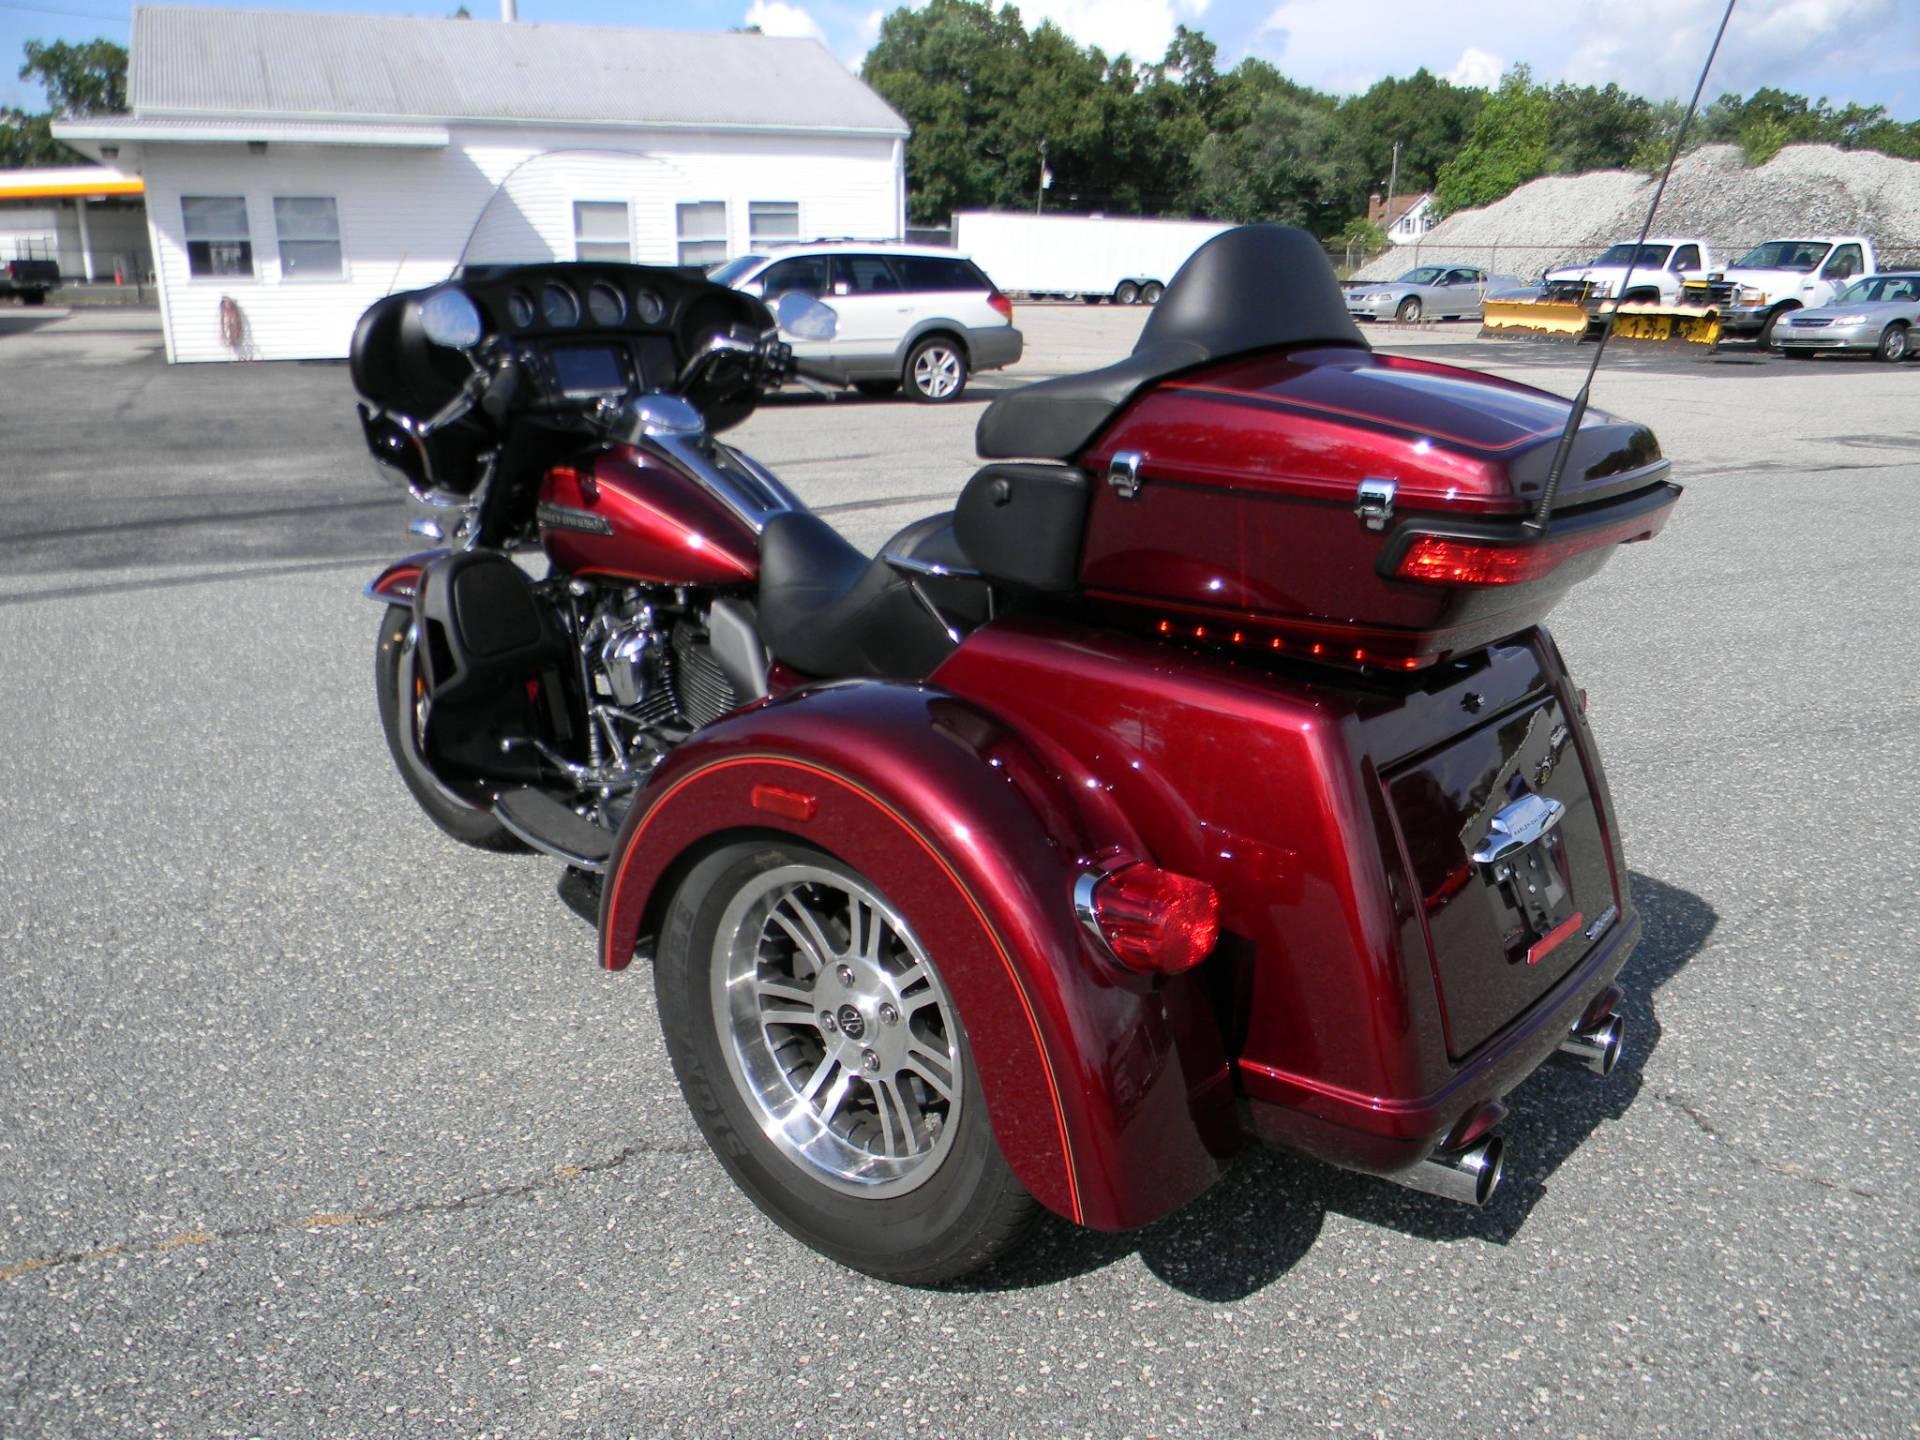 2017 Harley-Davidson Tri Glide® Ultra Trikes Springfield ... on vintage 3 wheel golf carts, harley-davidson golf cart tires, harley-davidson 3 wheeler kit, harley-davidson golf cart repair, 3 wheel gas golf carts, gas harley-davidson golf carts,